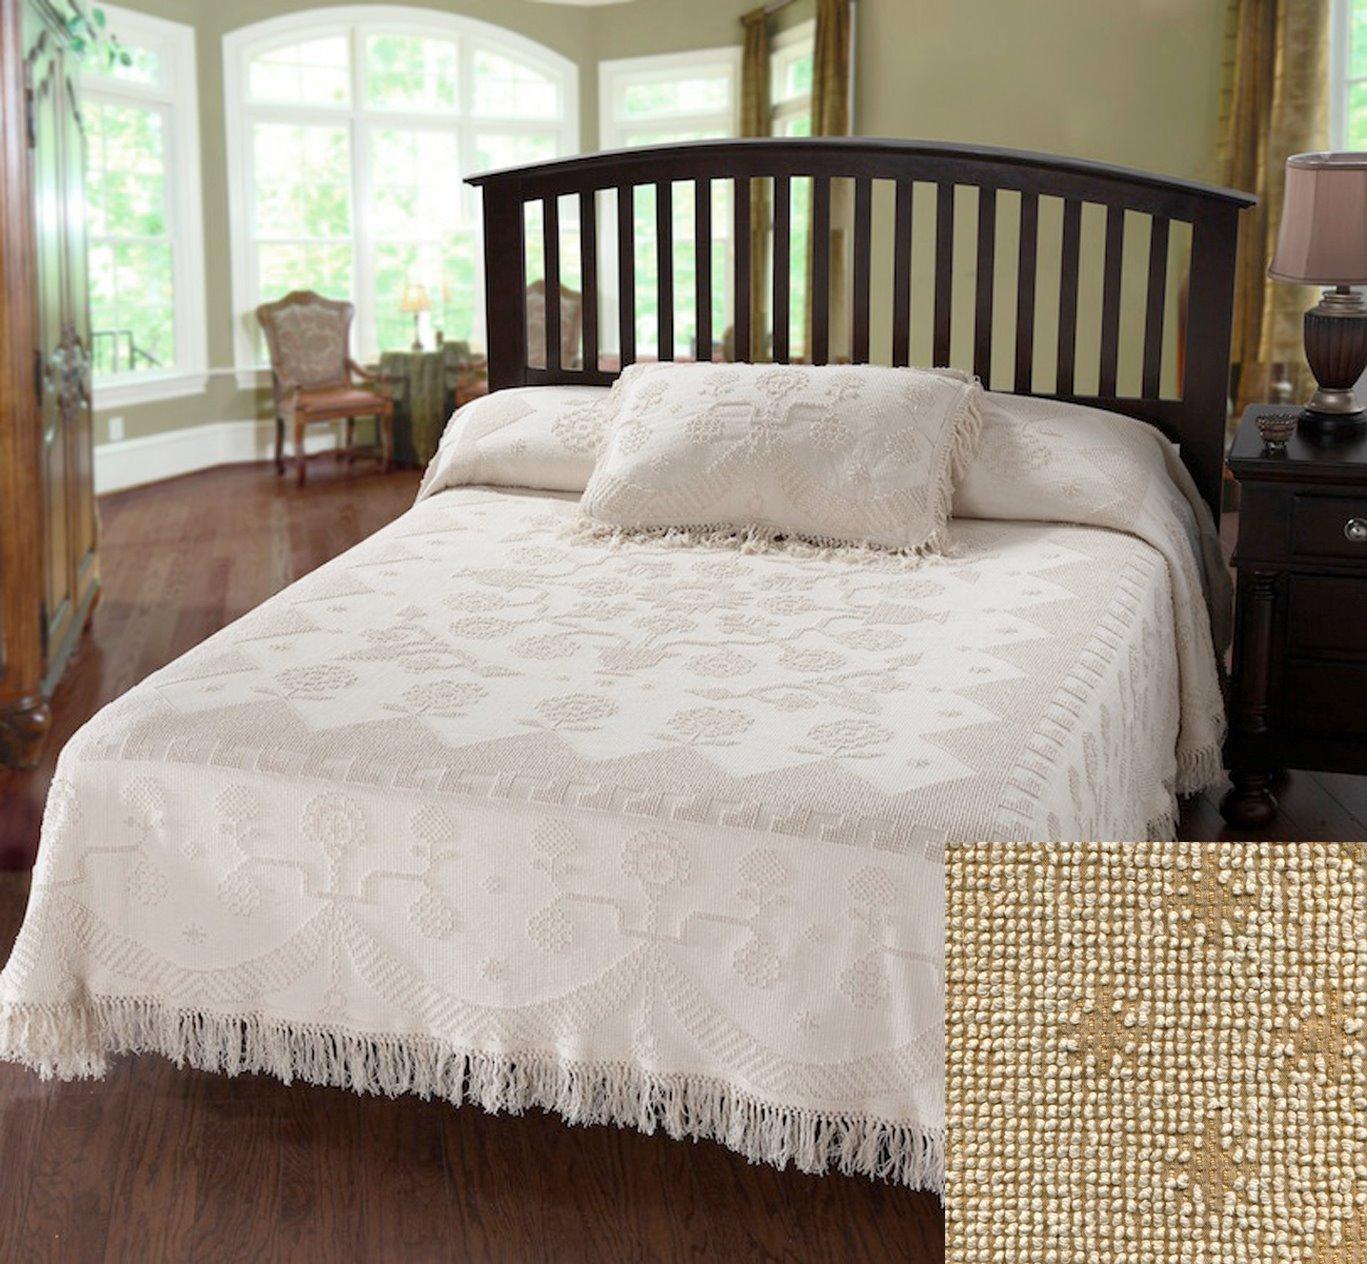 George Washington Bedspread Twin Linen